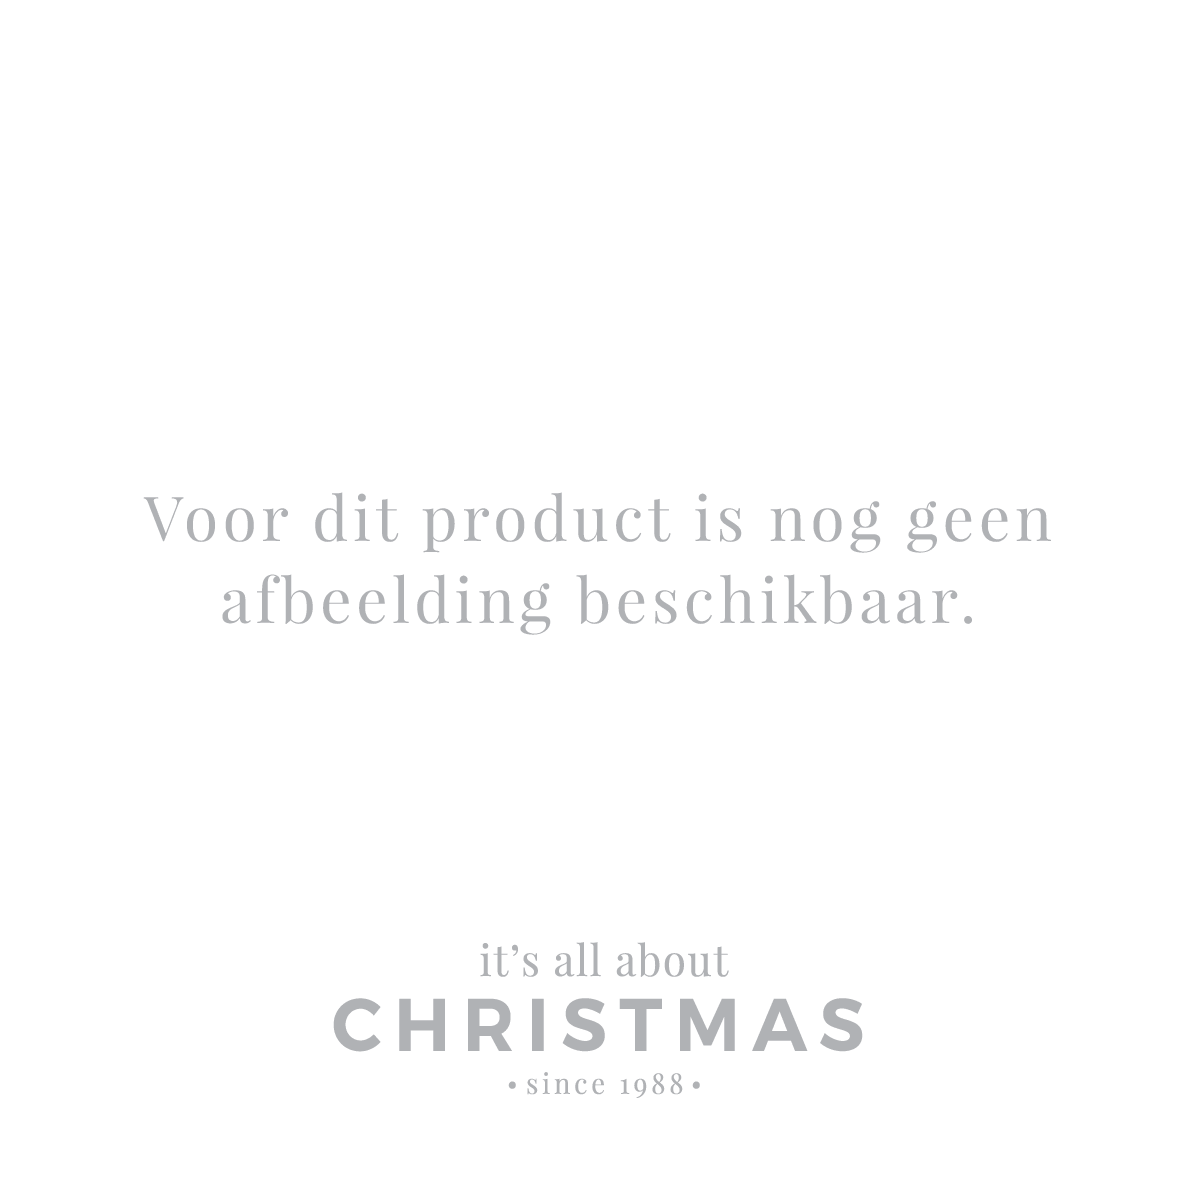 Christbaumkugeln Besondere.Christbaumkugel Champagner M Blumenzweigen It S All About Christmas